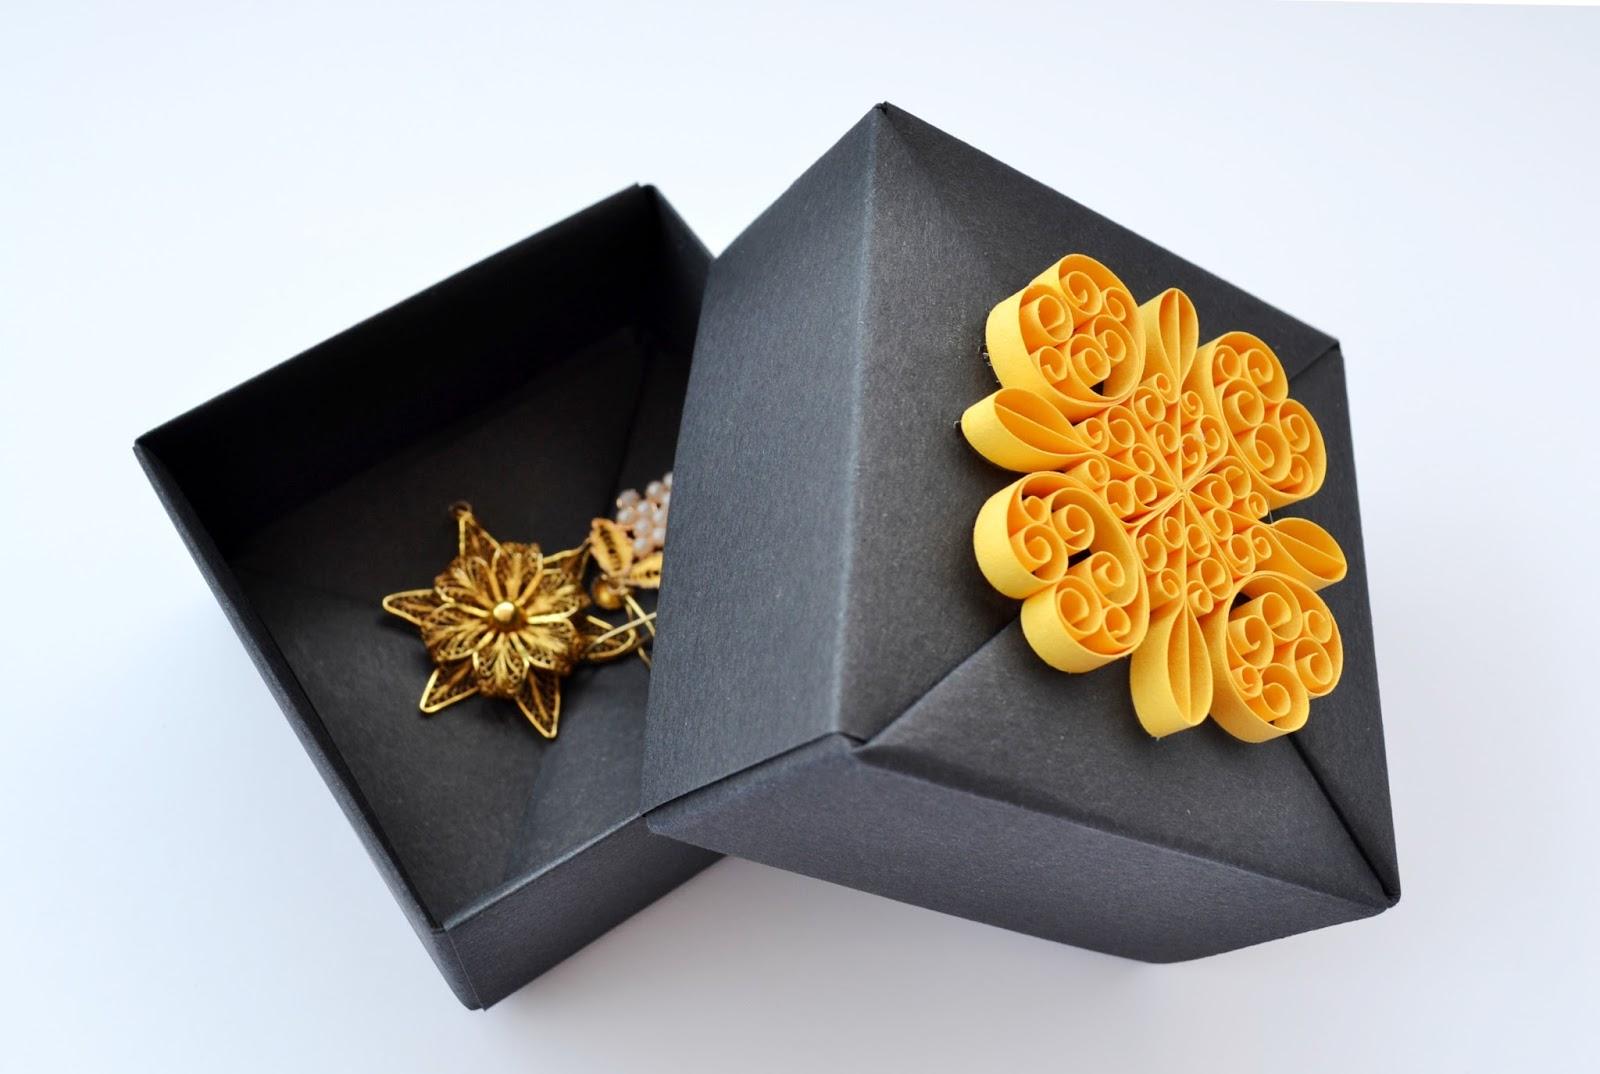 Kağıtla Küçük şeyler: Handmade Gift Boxes With Quilling